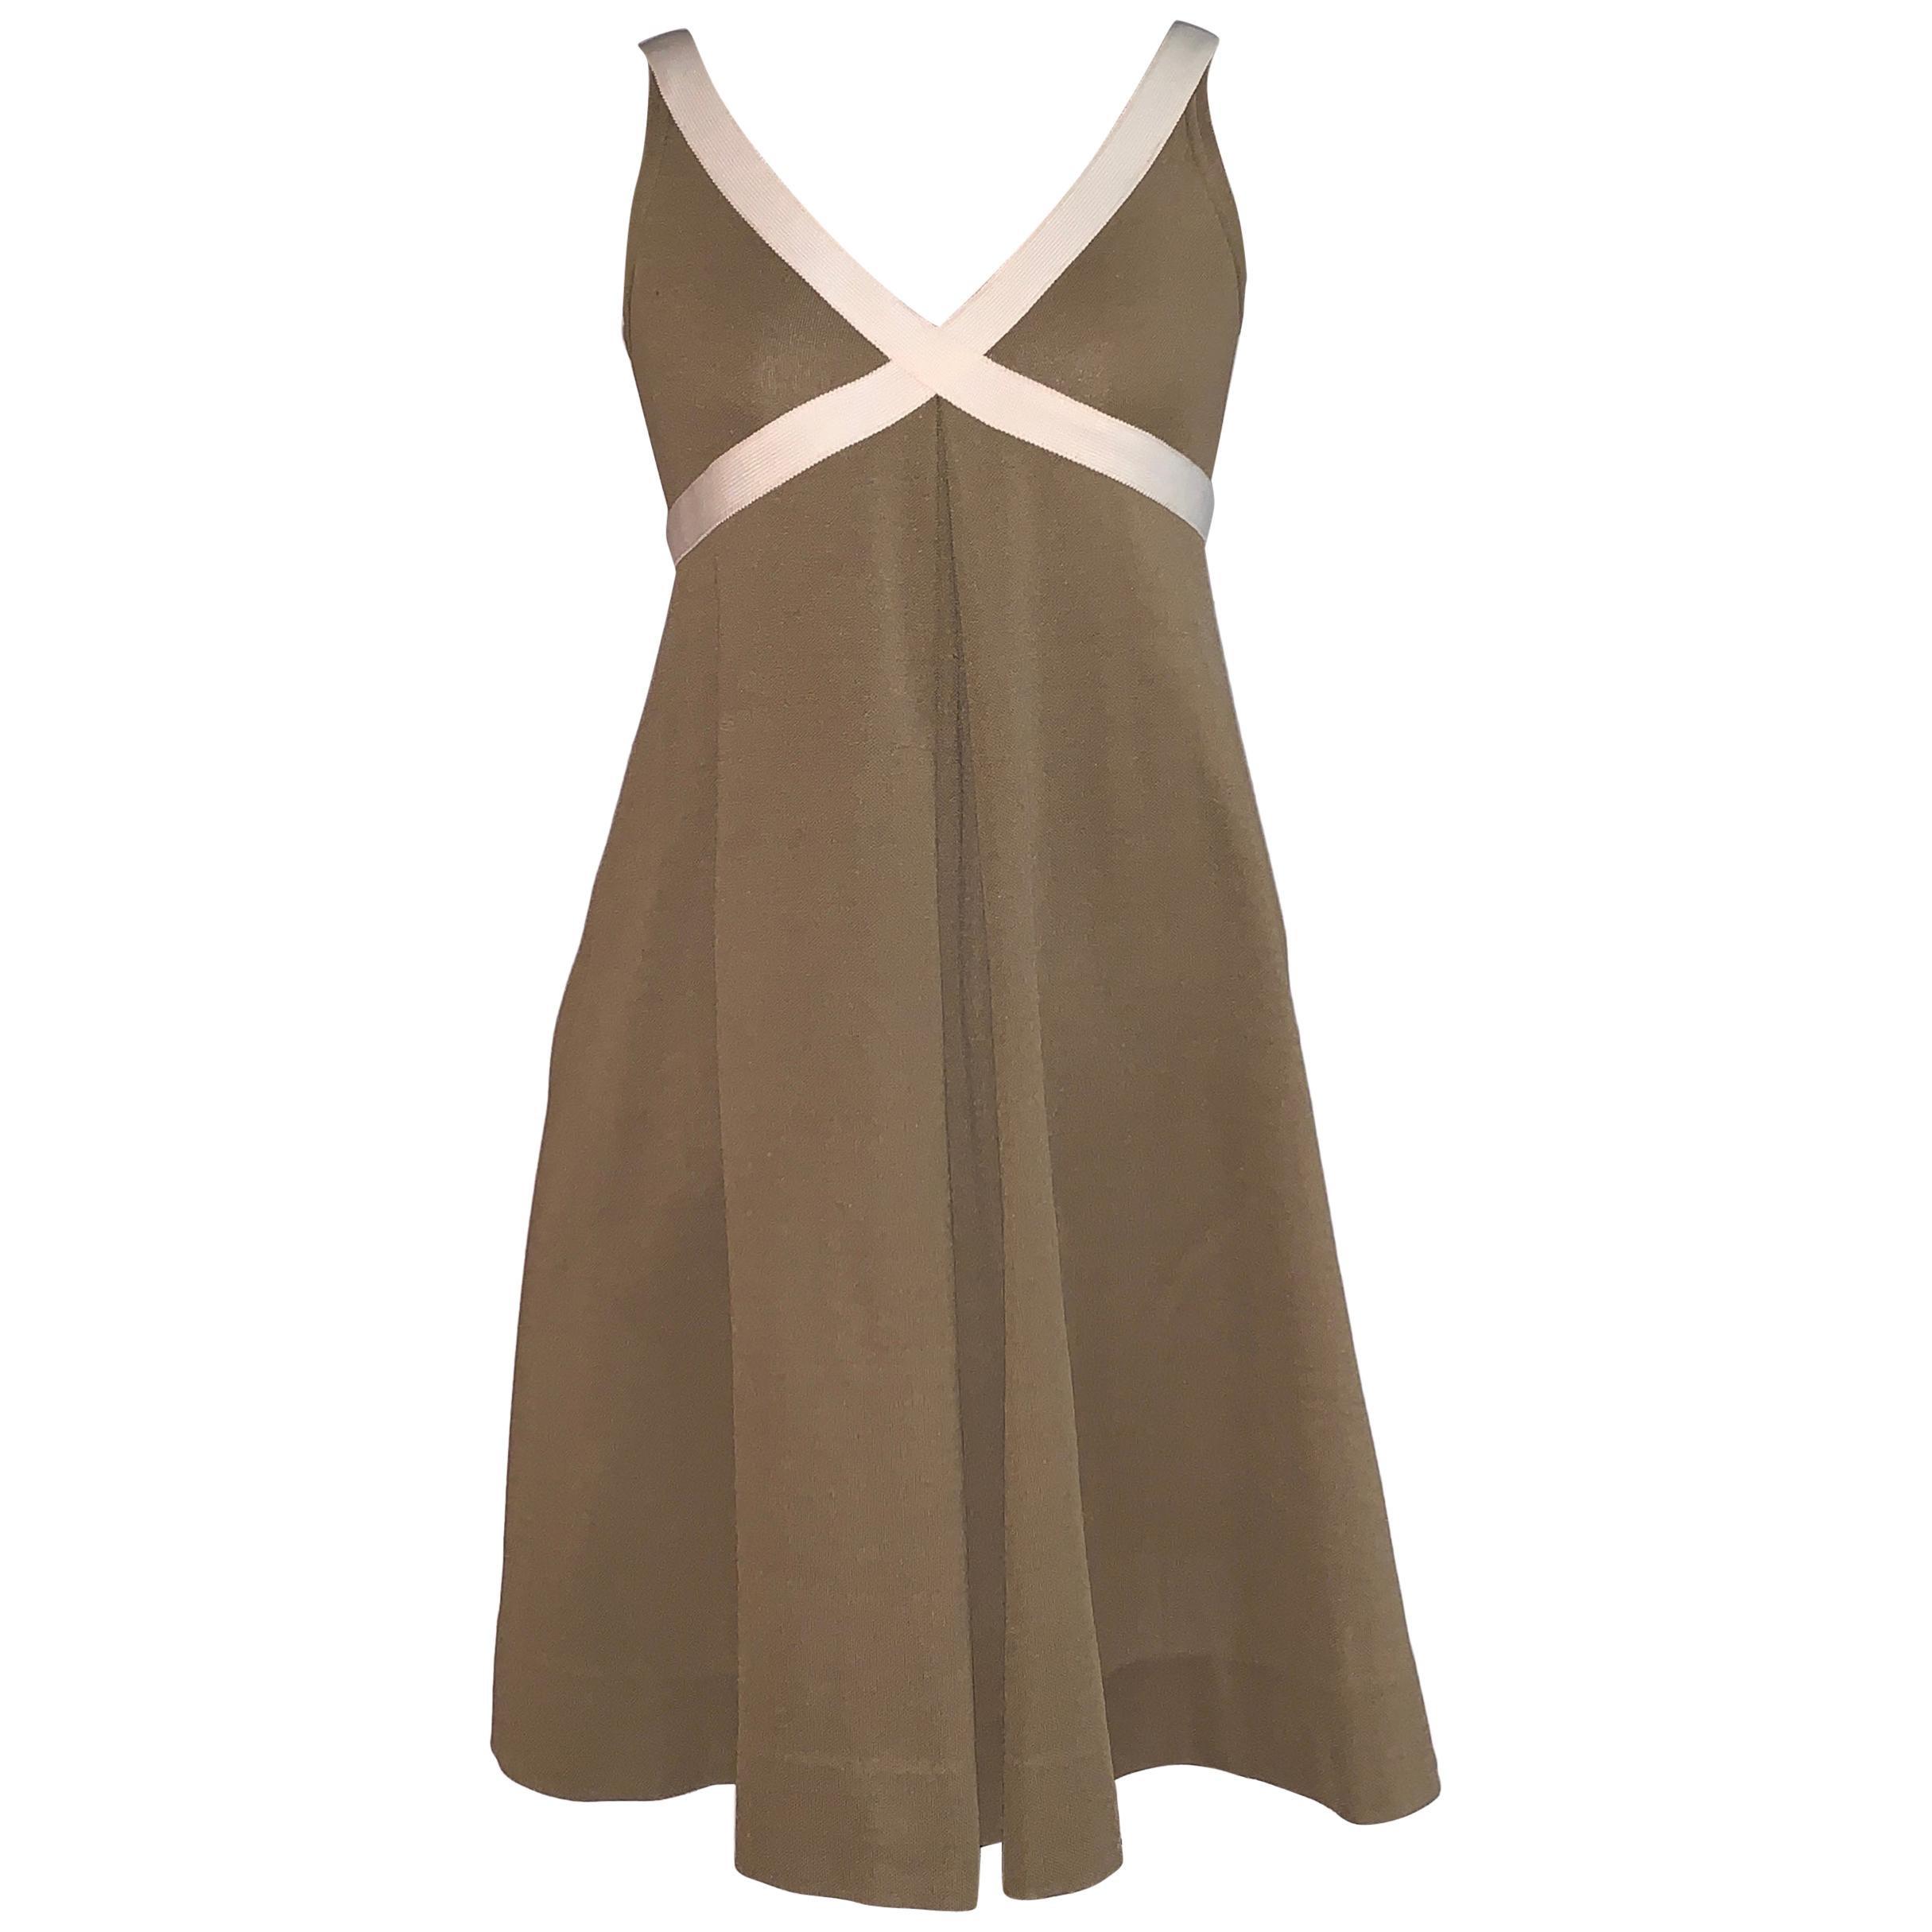 Rudi Gernreich 1960s Knit Cross My Heart Dress in Brown and Cream